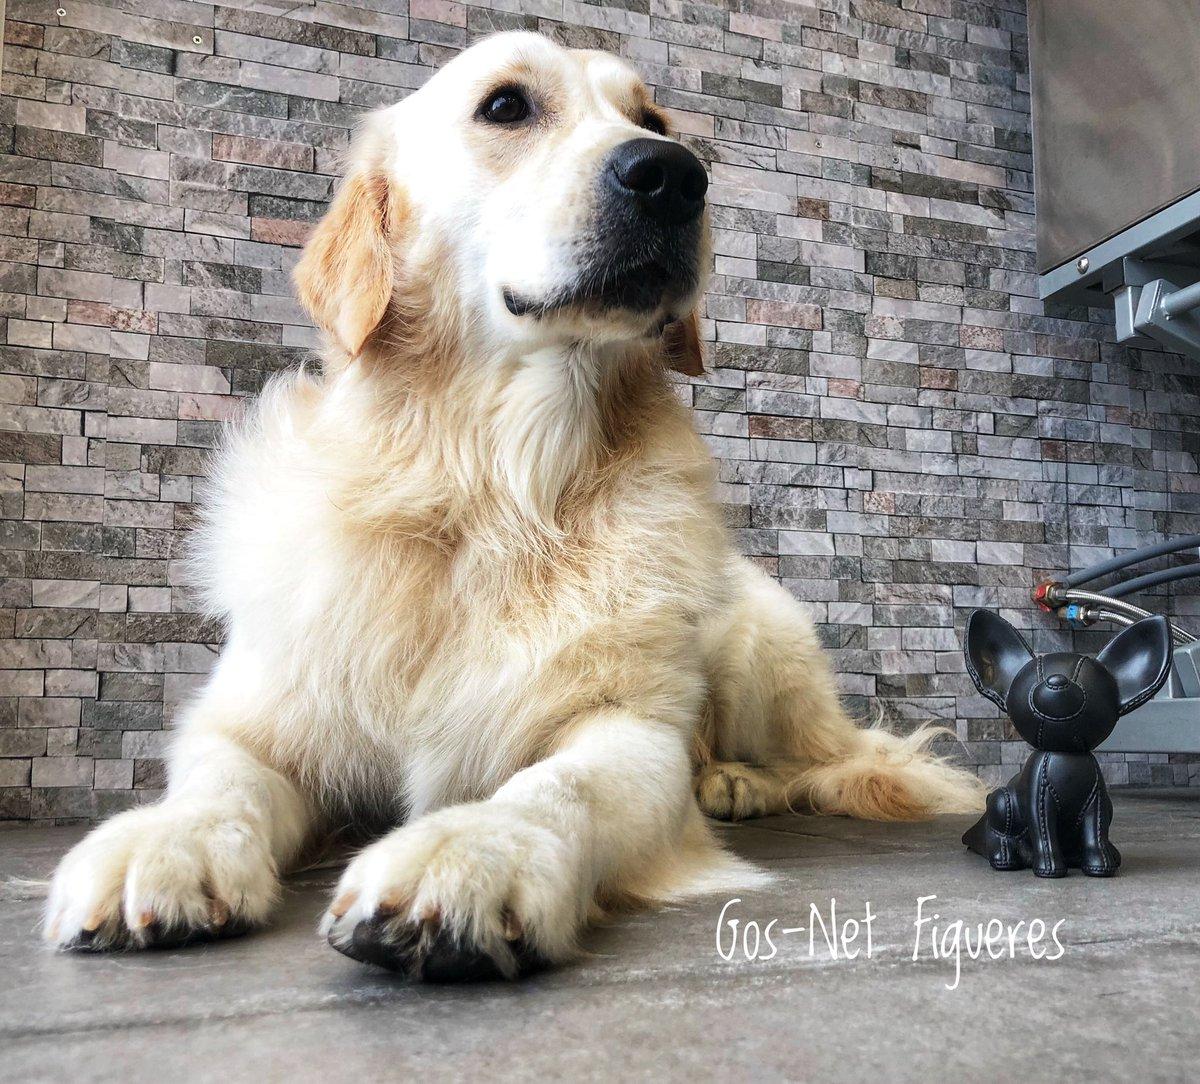 Ares, precioso #golden... más bueno no se puede ser, que regalo trabajar con animales♥️🐾✂️😍 #gosnetfigueres #belleza #mircat #equipazo #mascotas #diadelperro #partidopacma #spam #caninos #perros #figueres #empordà #bondia #gracies #gracias #costabravapirineu #net #mascotanet https://t.co/fH6jXPIi1B